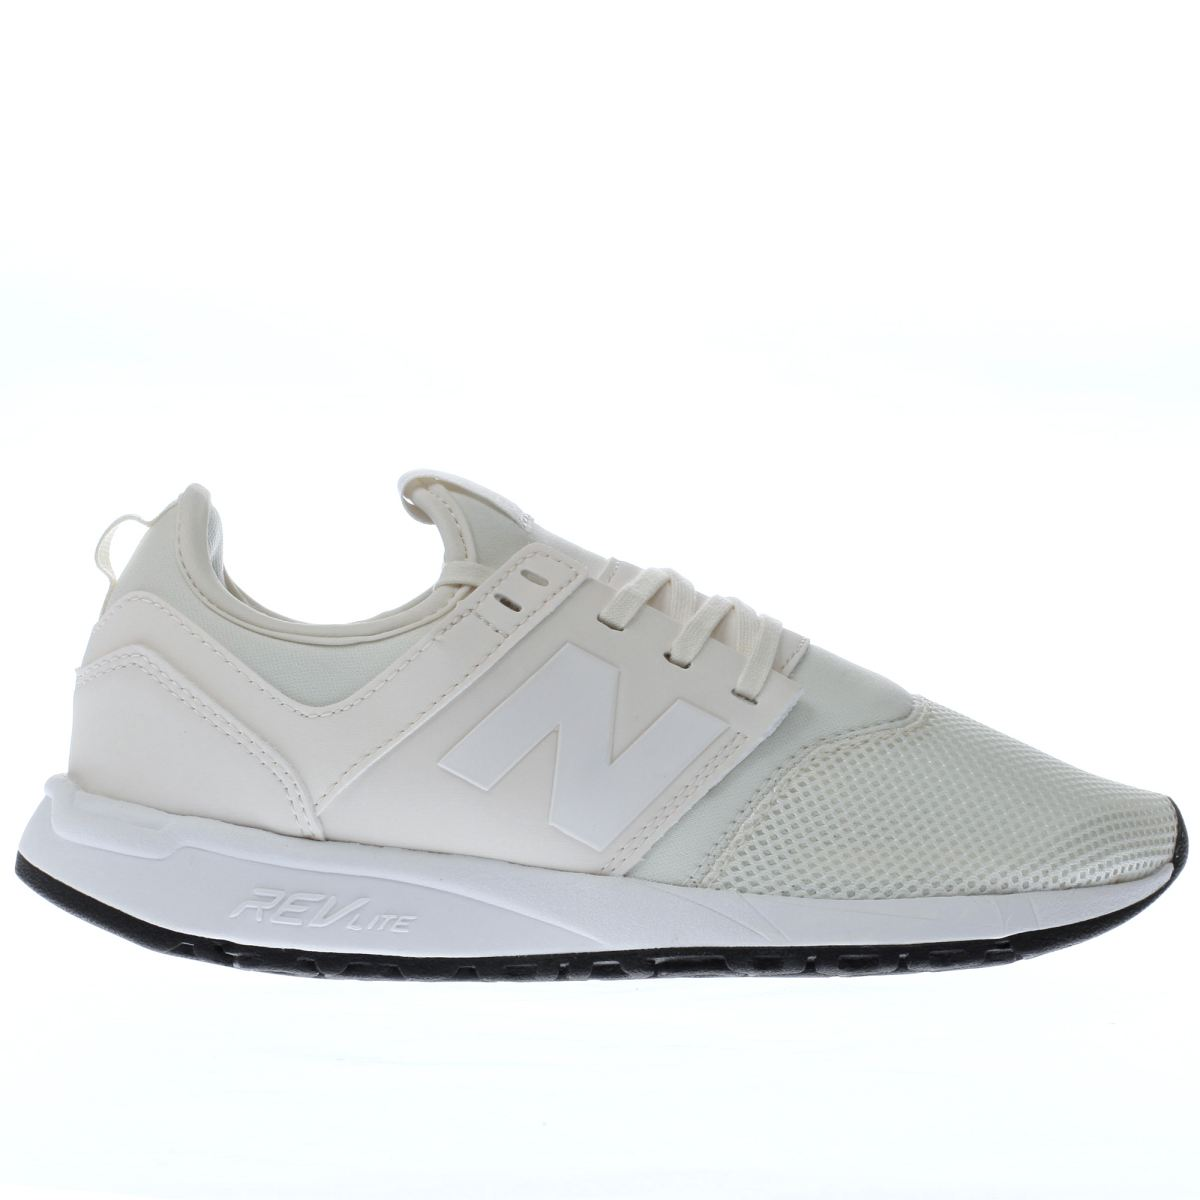 new balance beige 247 classic trainers